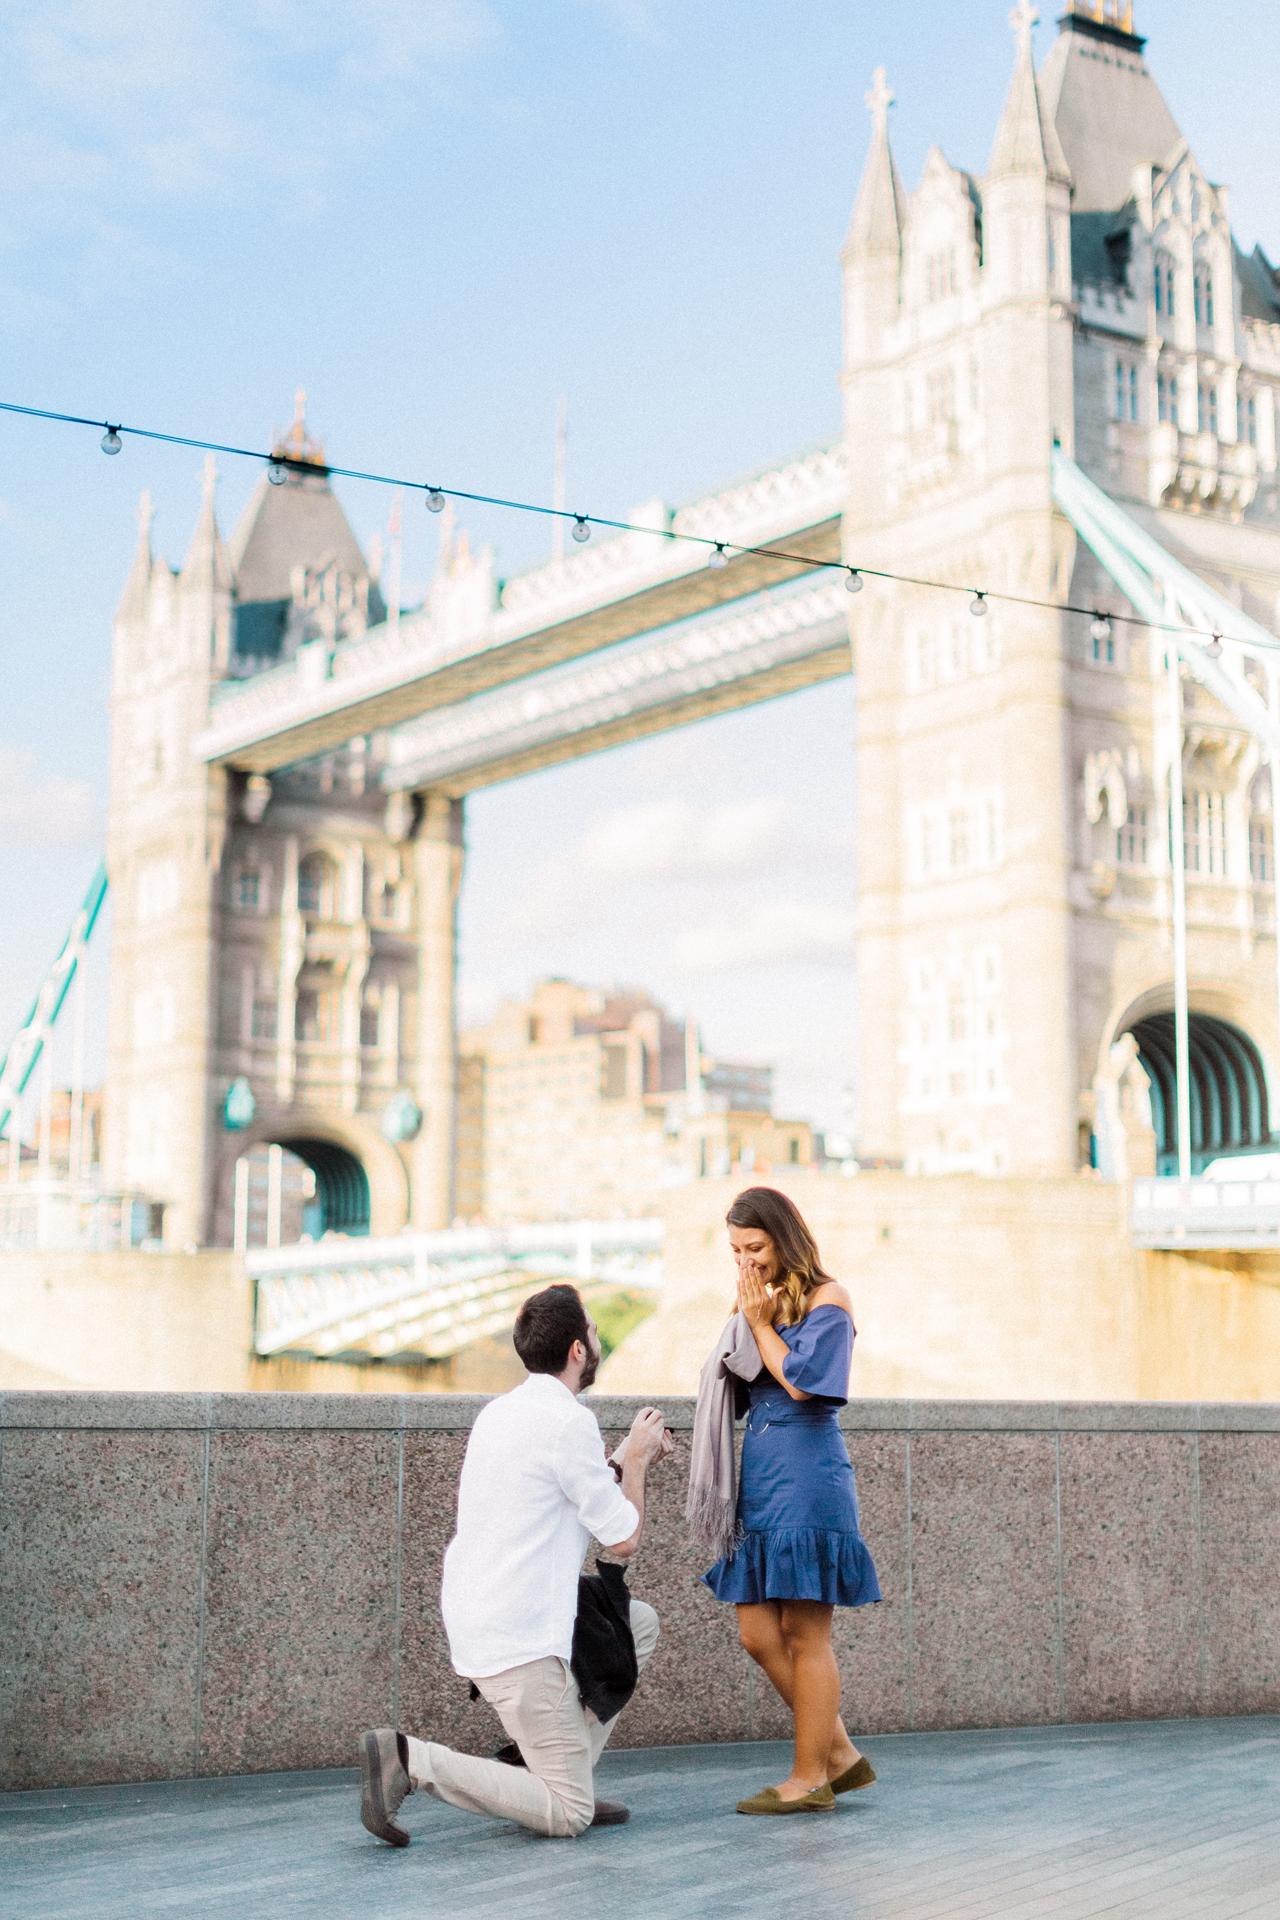 Proposal Planning - Tower Bridge London Proposal - Charlotte Munro Weddings - Sanshine Photography